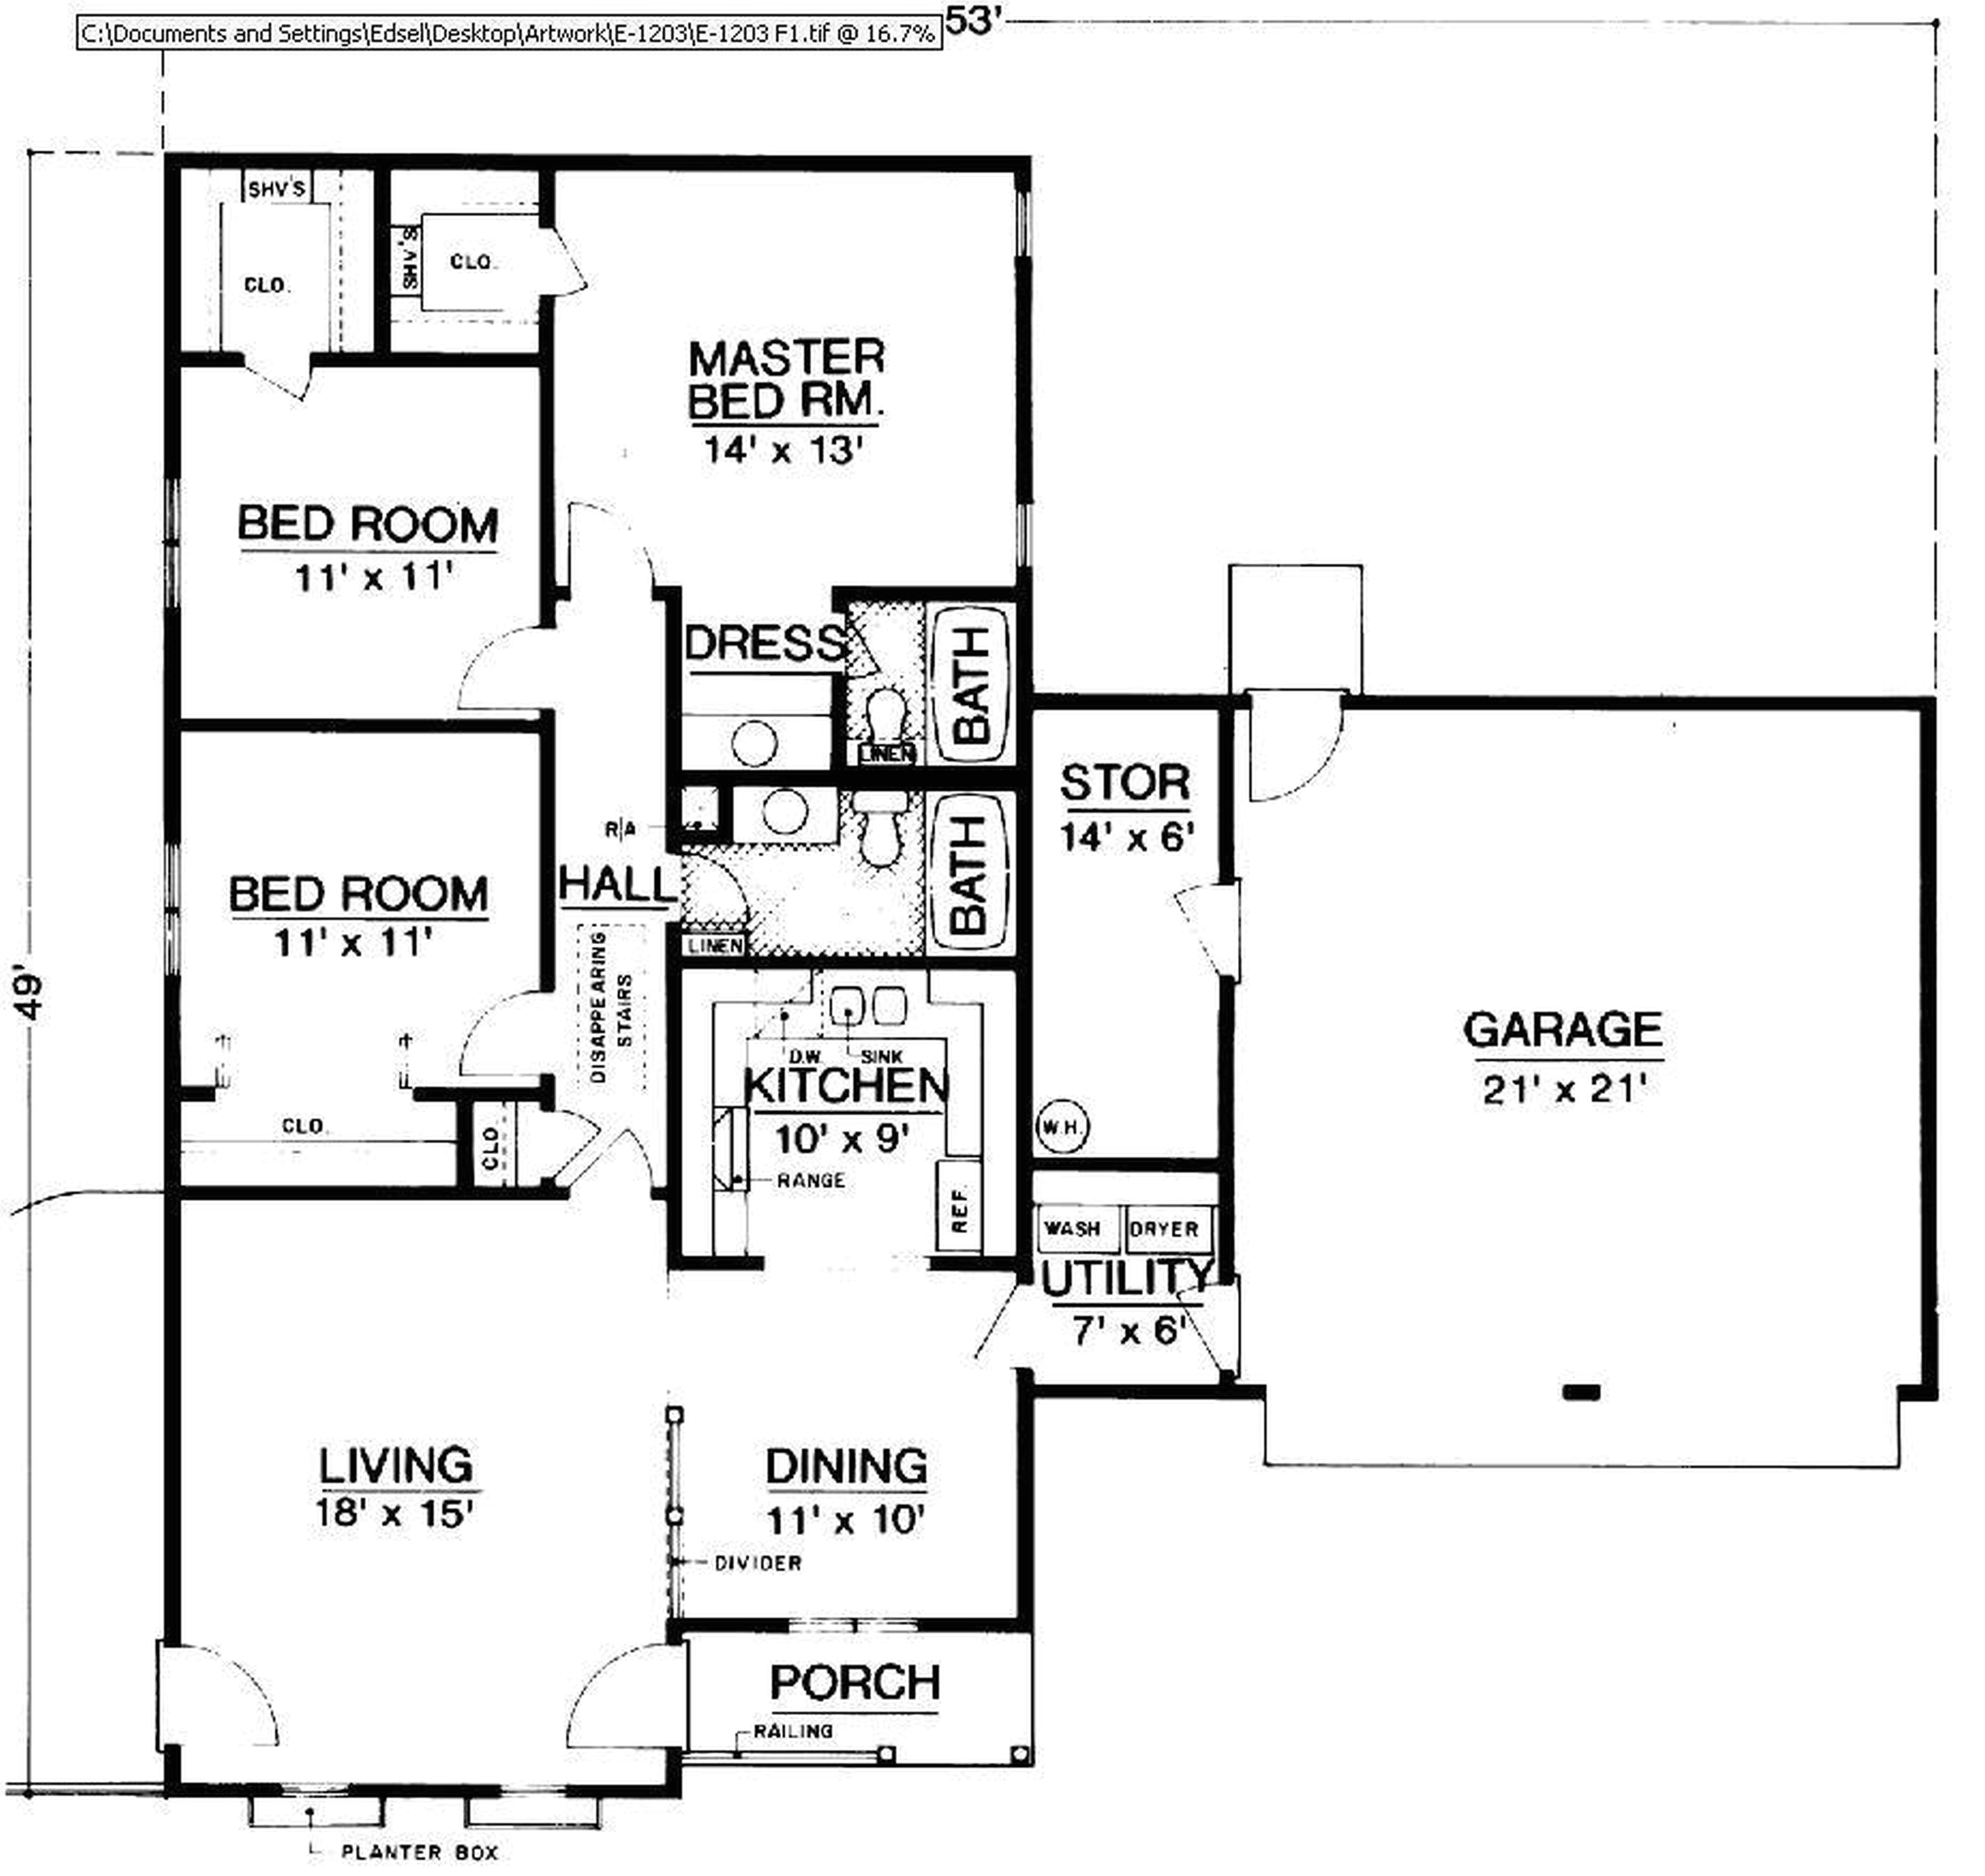 draw floor plans delighful draw deck plans online fice floor plan line draw example on